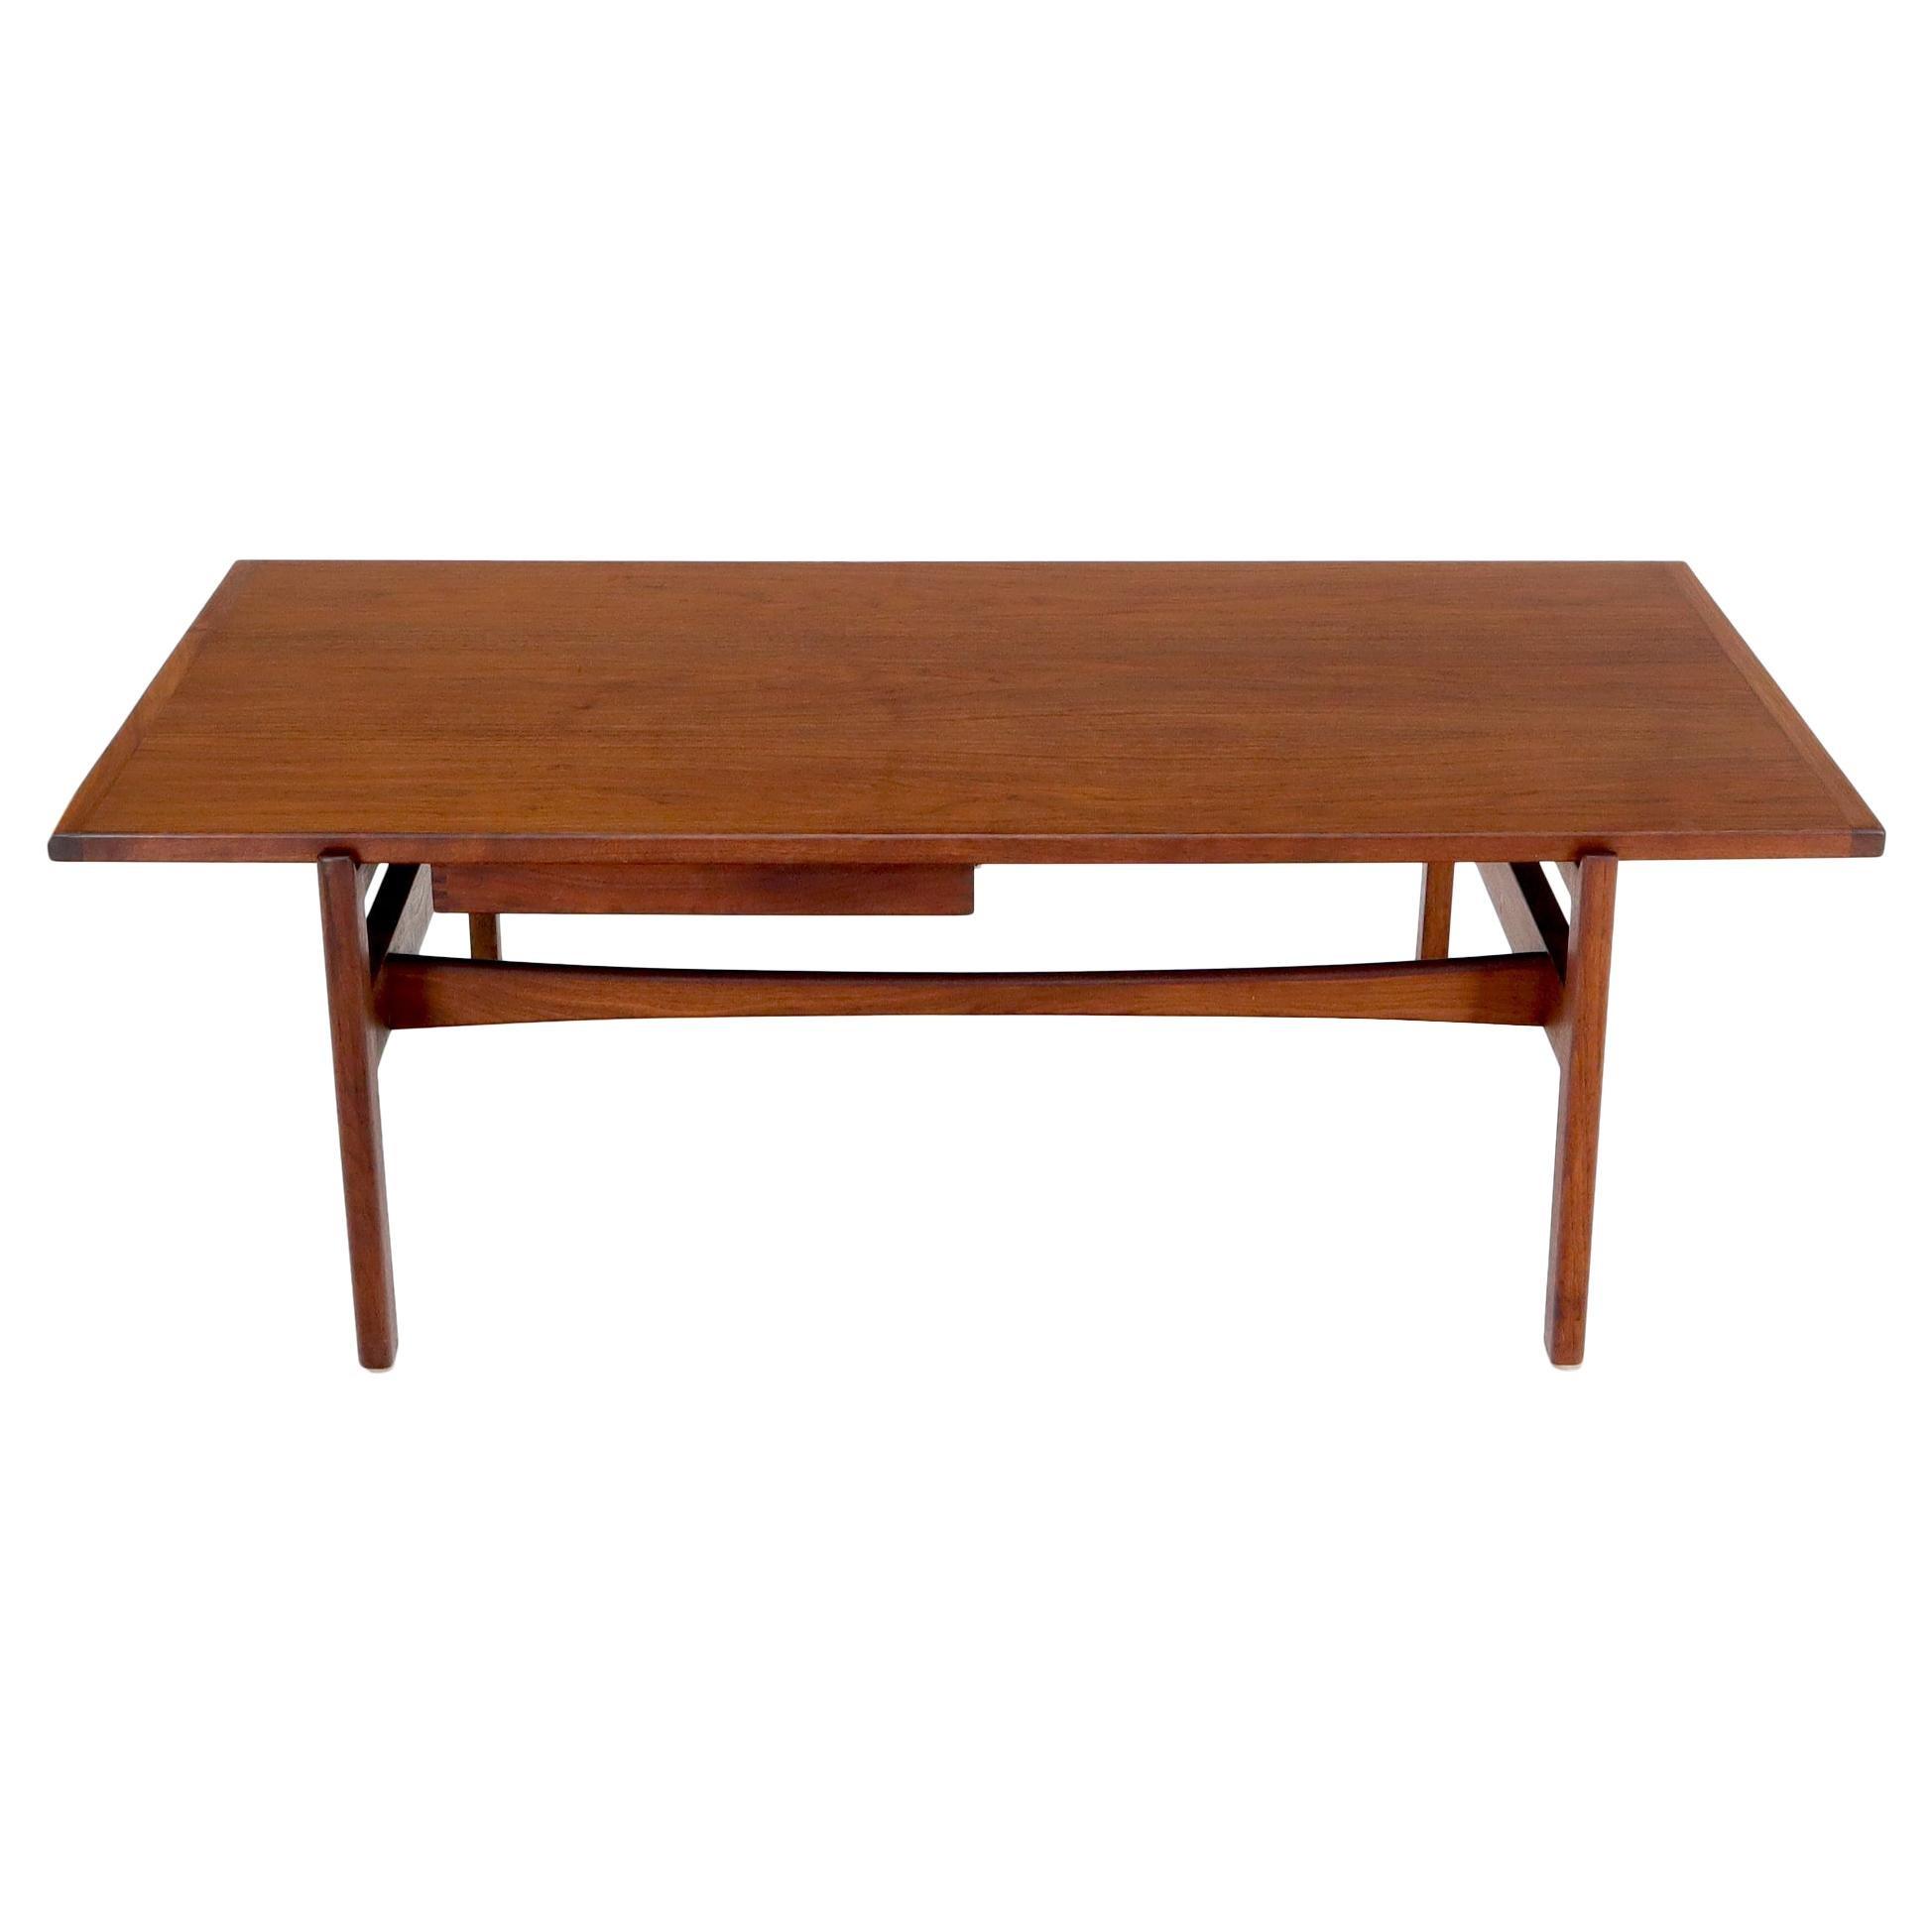 One Drawer Rectangle Shape Teak Danish Mid-Century Modern Coffee Table